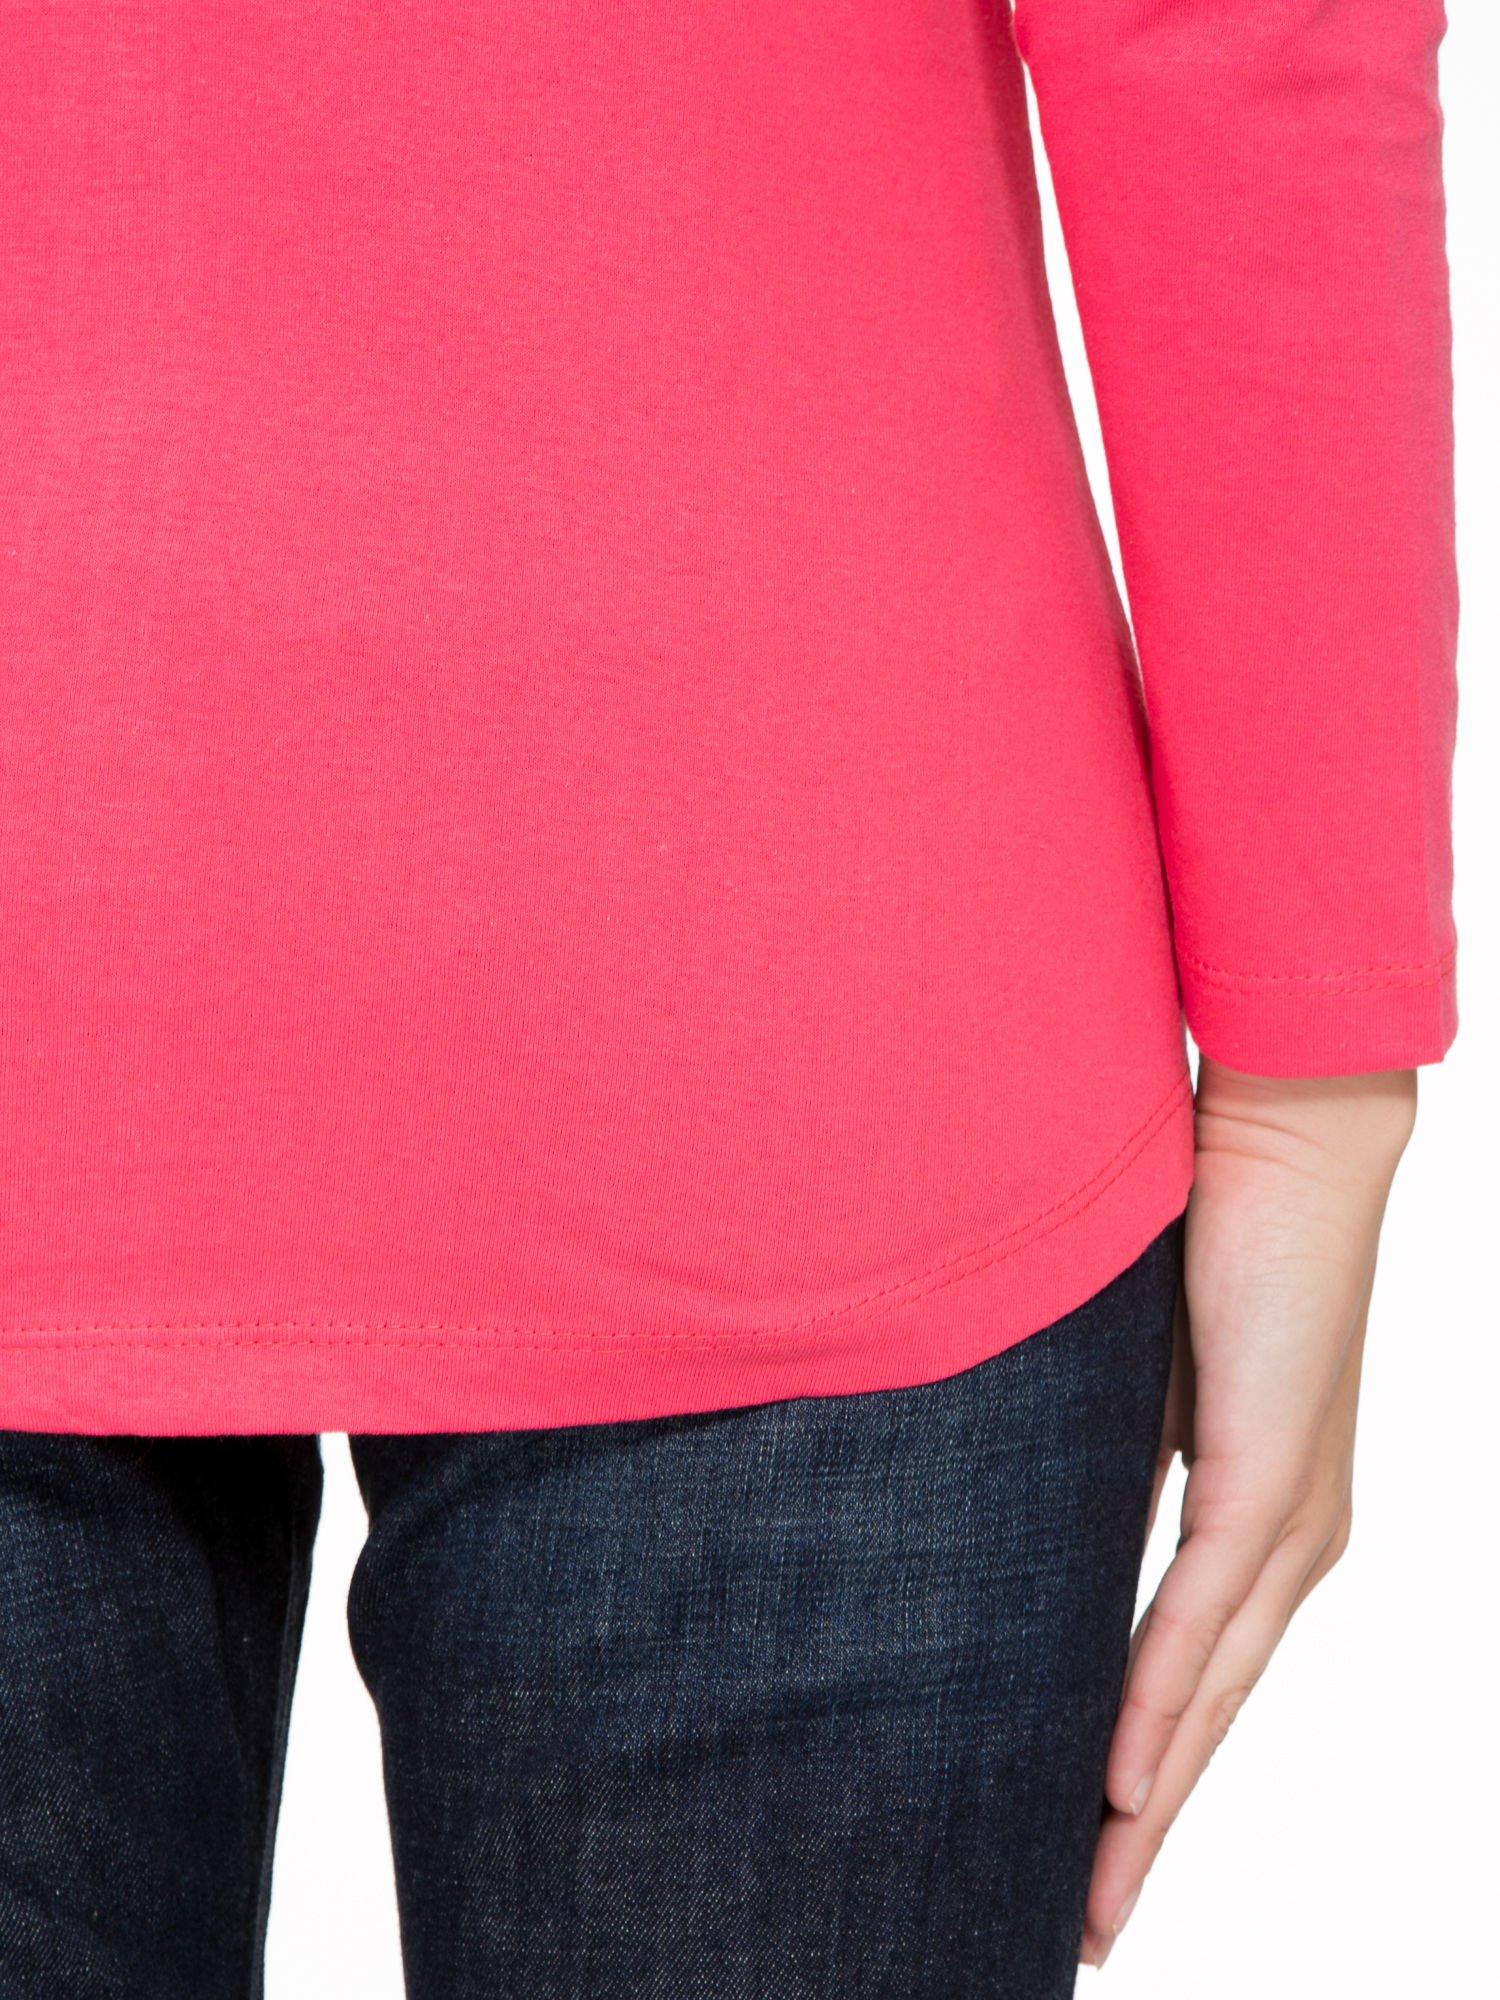 Koralowa bluzka z napisem CRAZY i nadrukiem fashionistek                                  zdj.                                  9